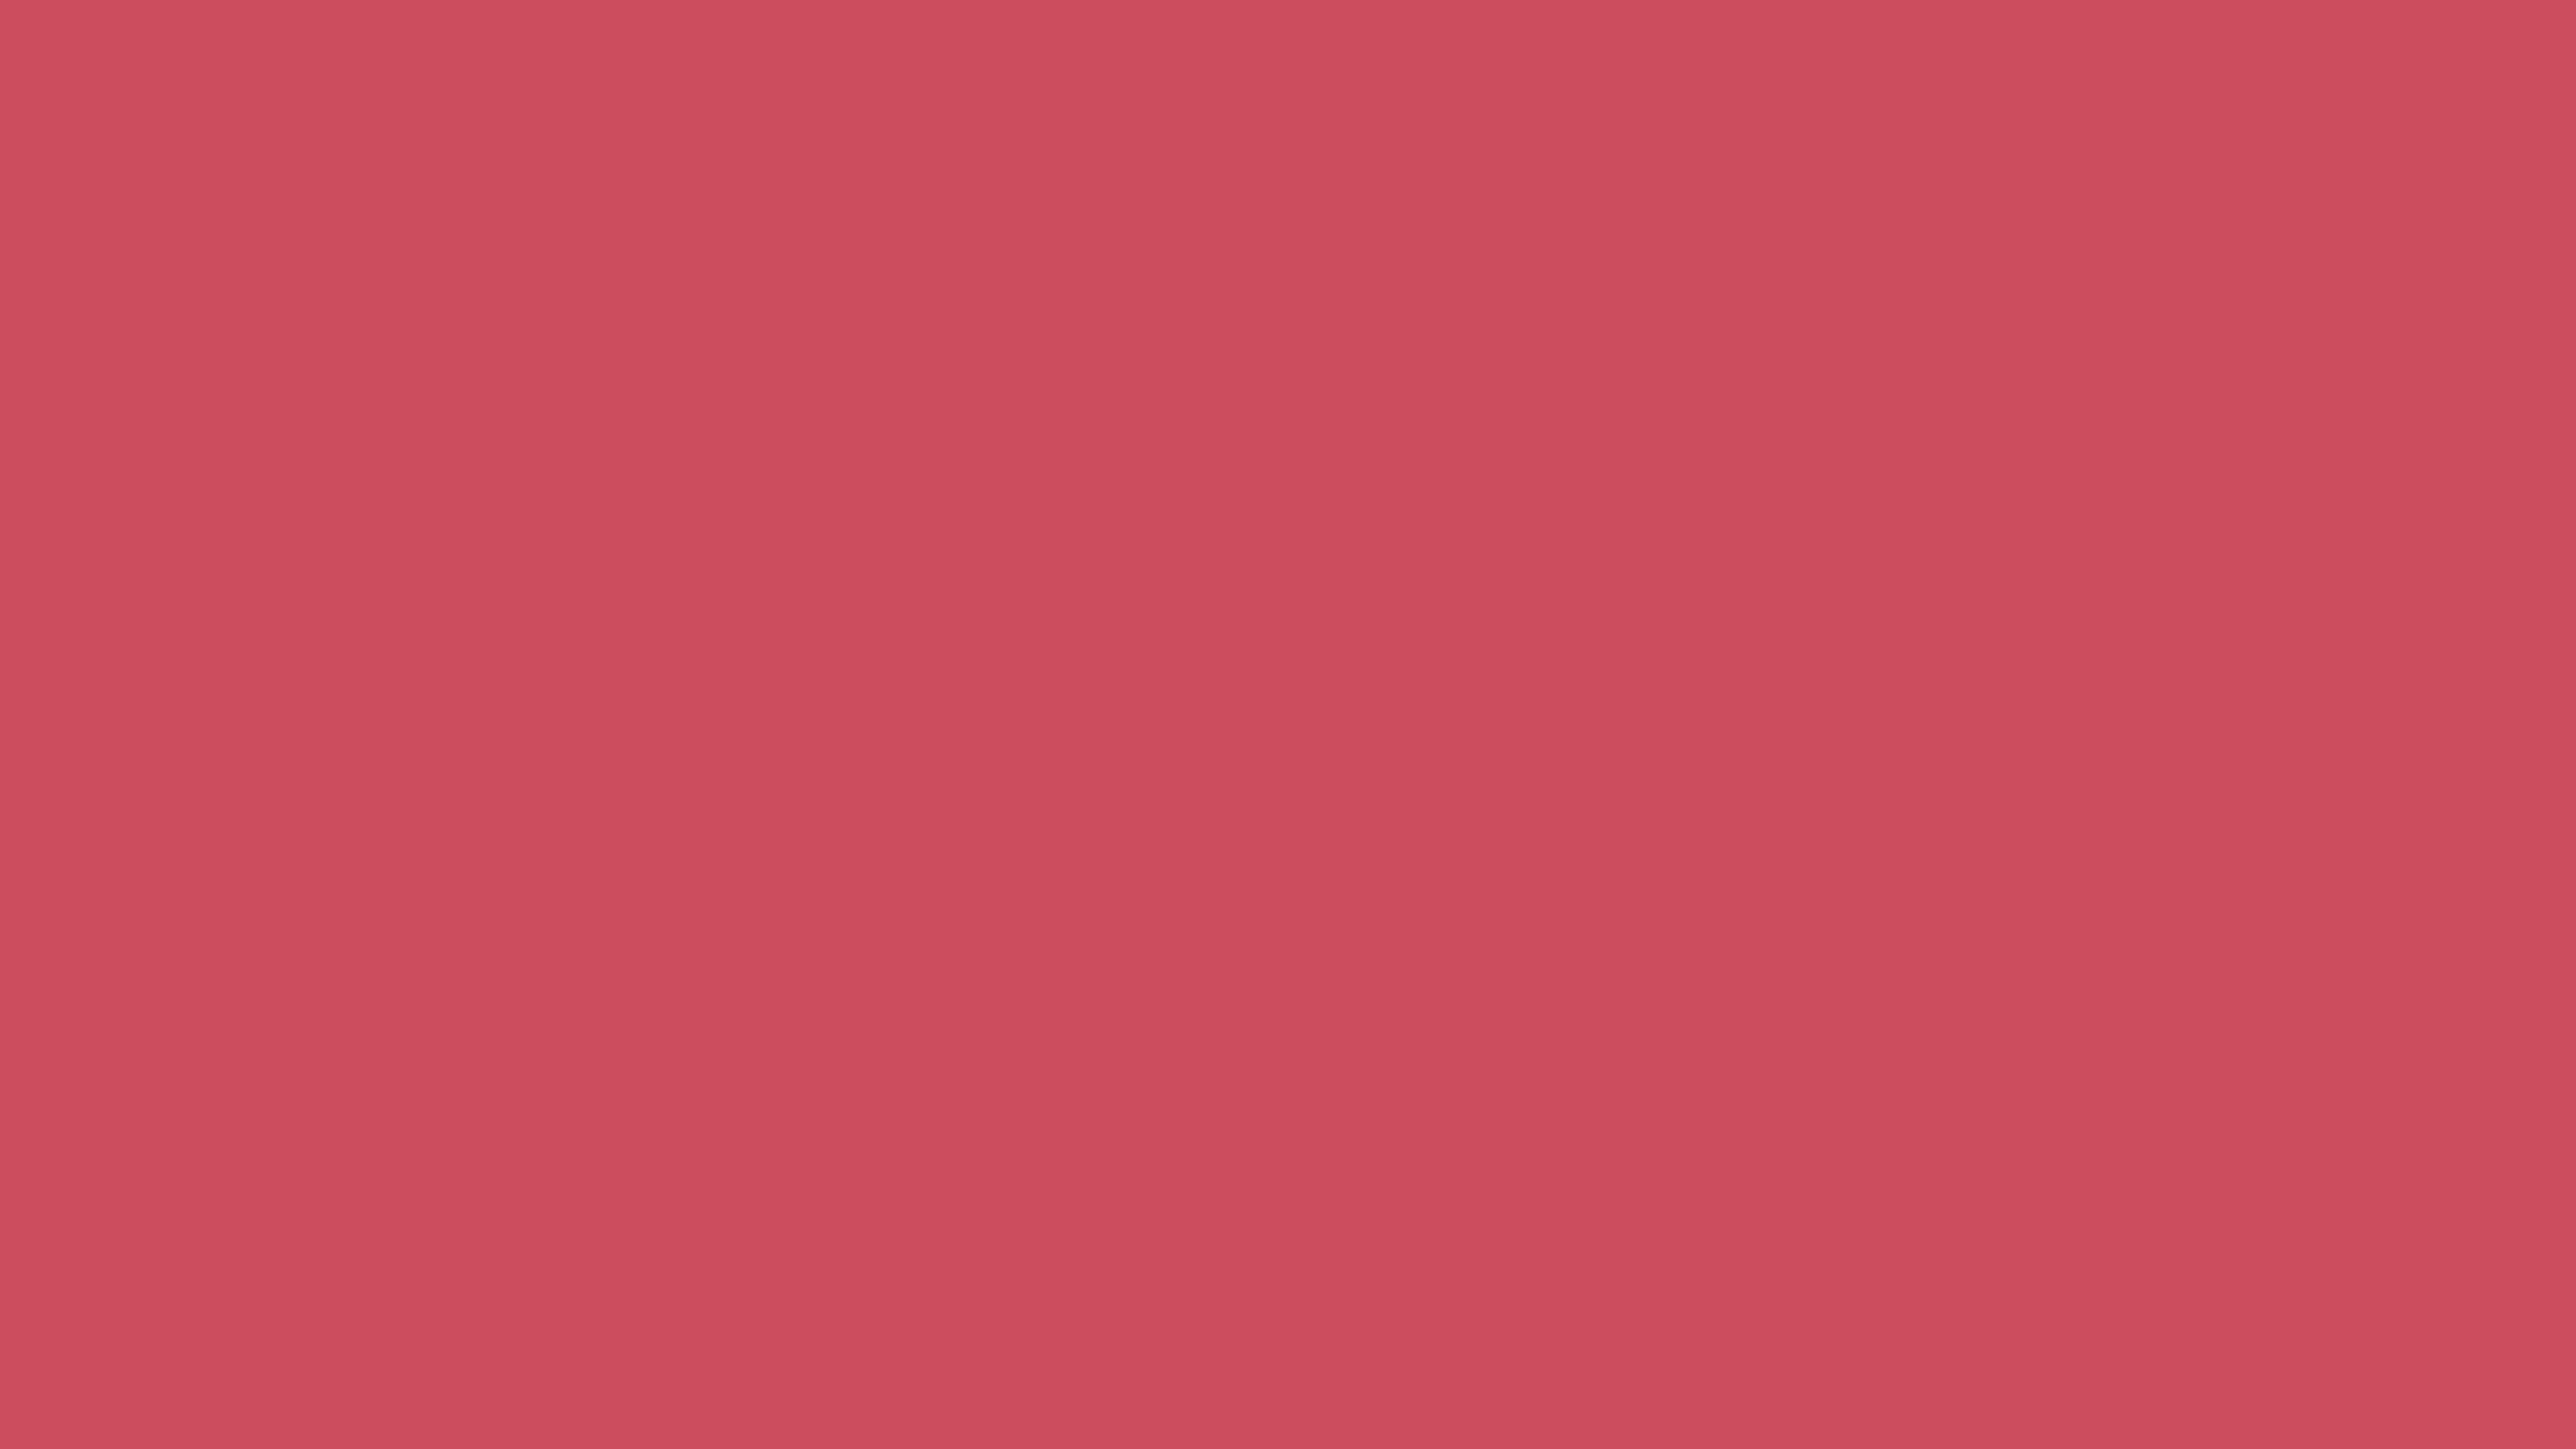 3840x2160 Dark Terra Cotta Solid Color Background